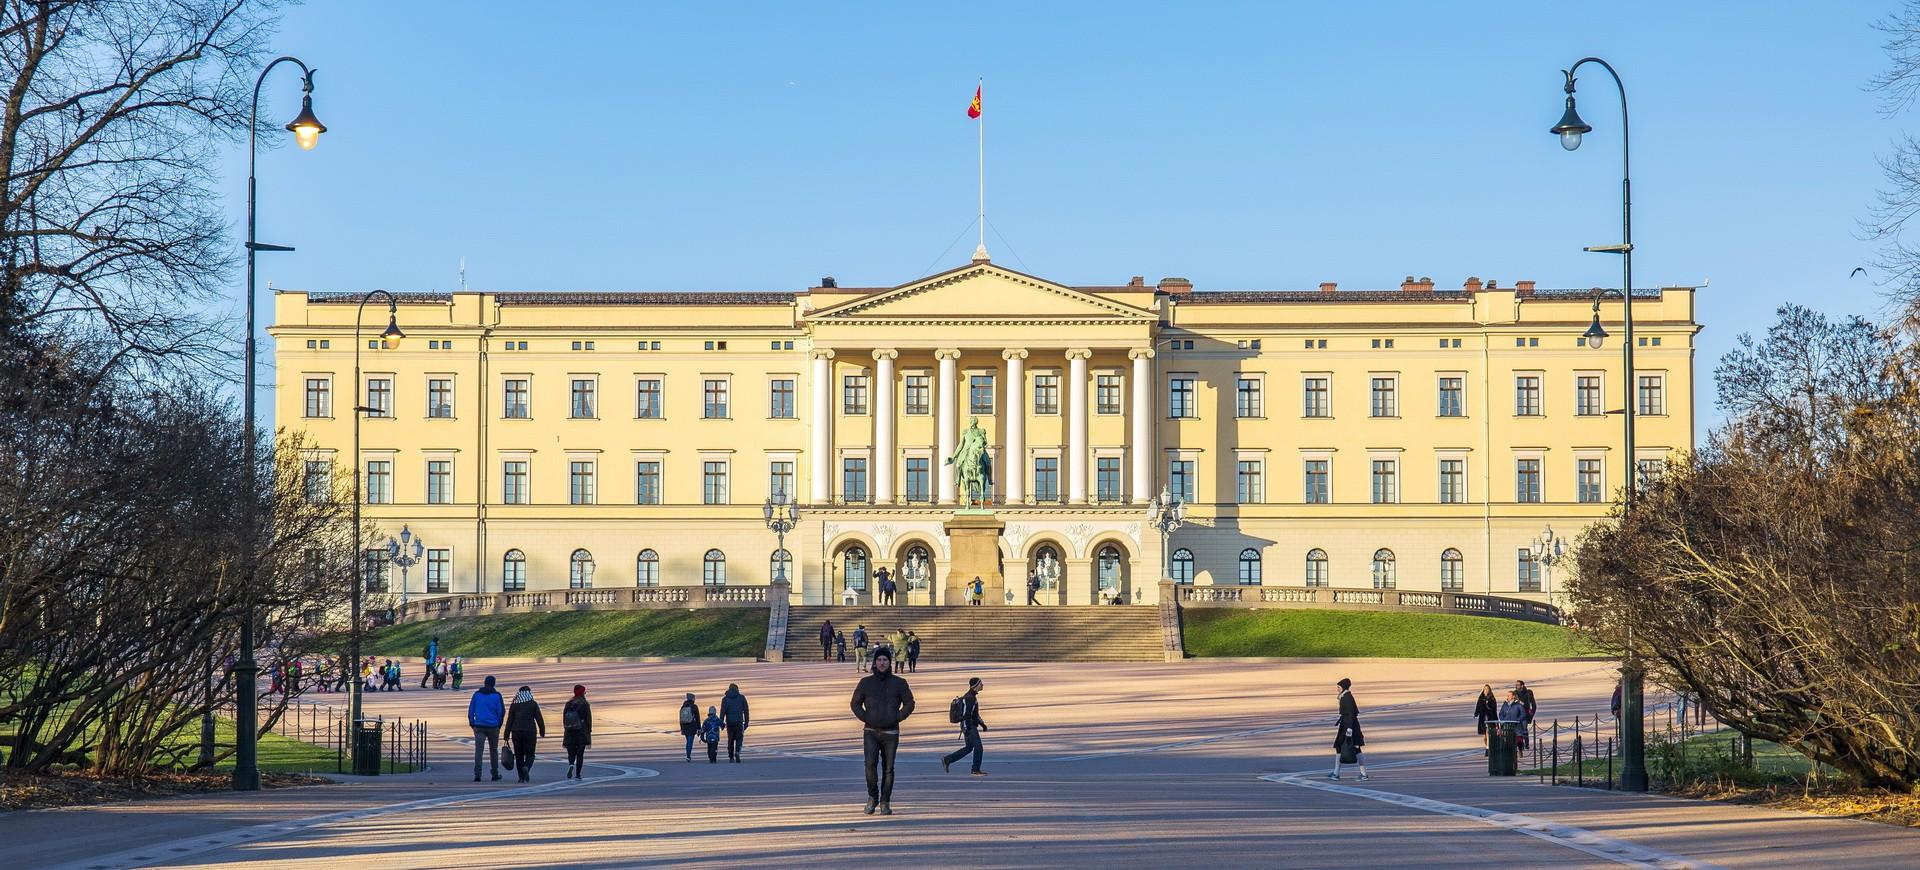 Palais Royal Kongelige Slott à Oslo